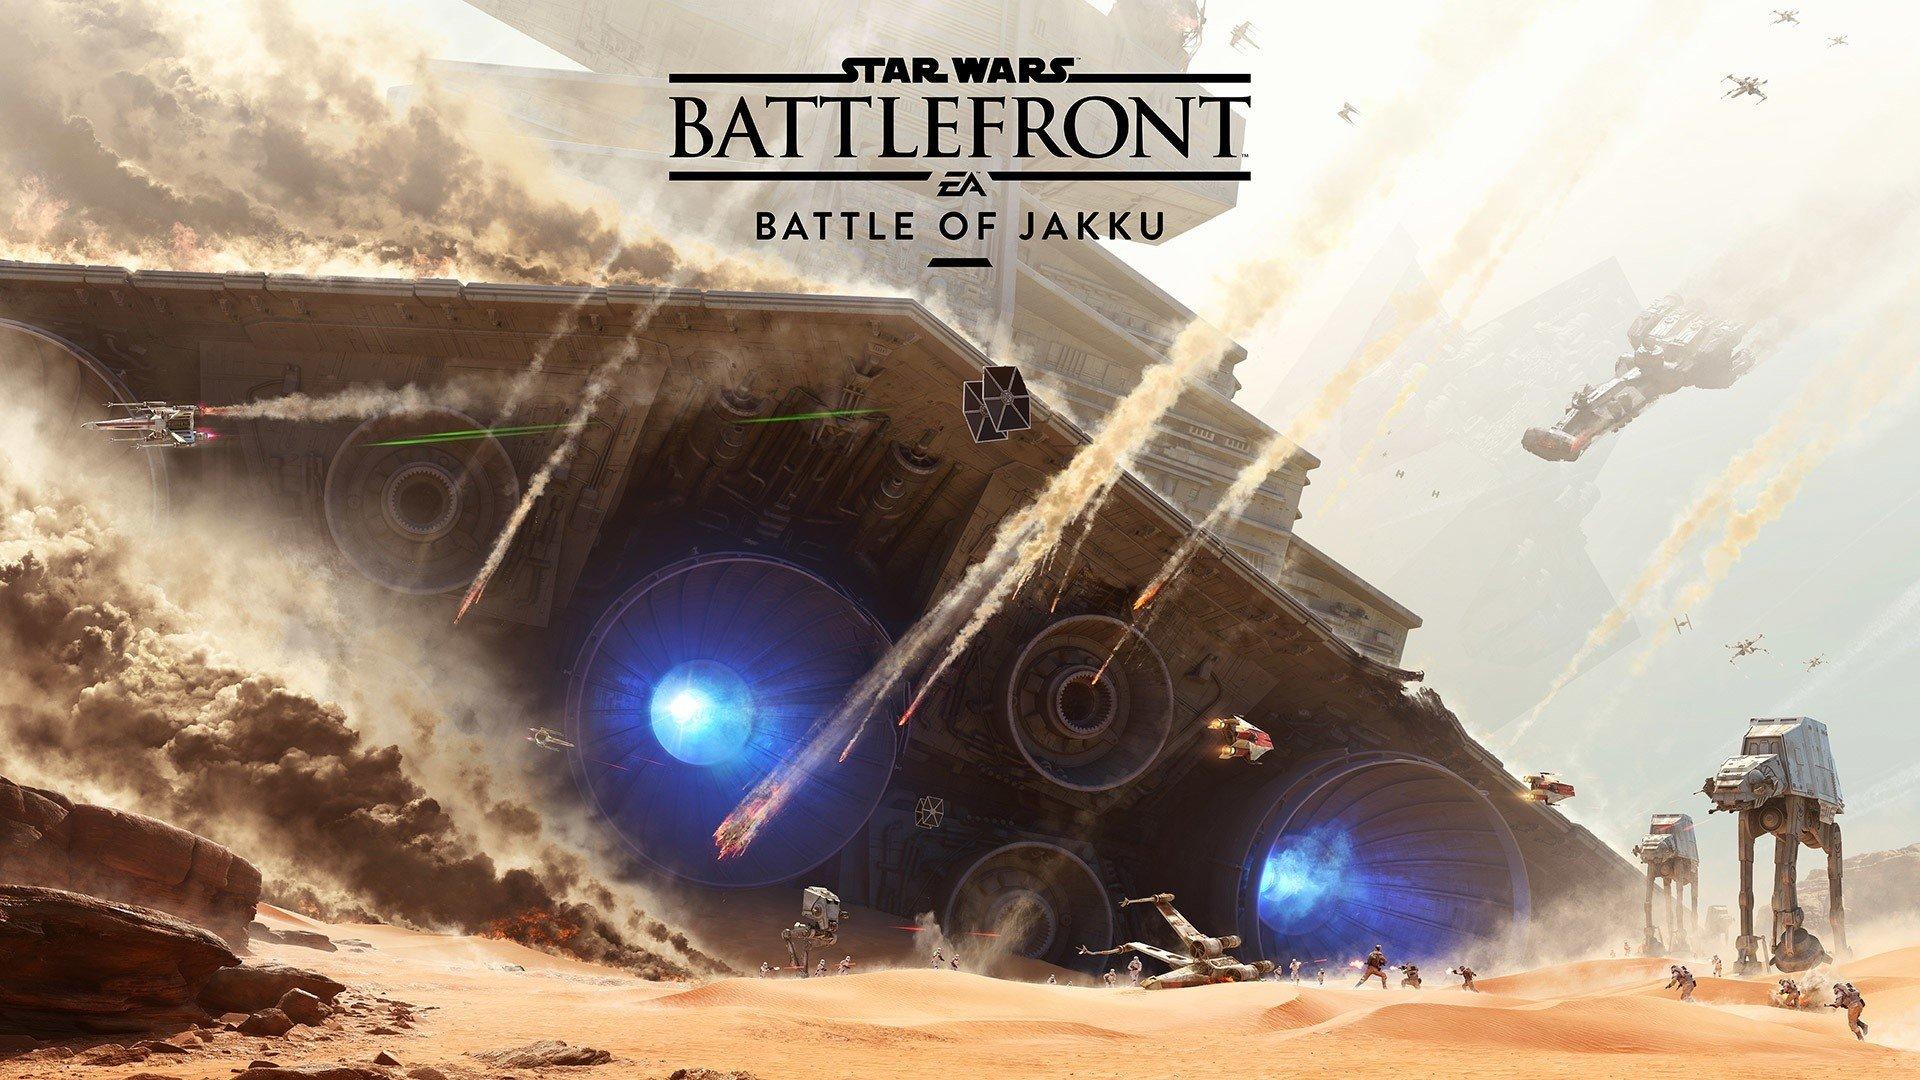 Fondo de pantalla de Batalla de Jakku en Star Wars Battlefront Imágenes